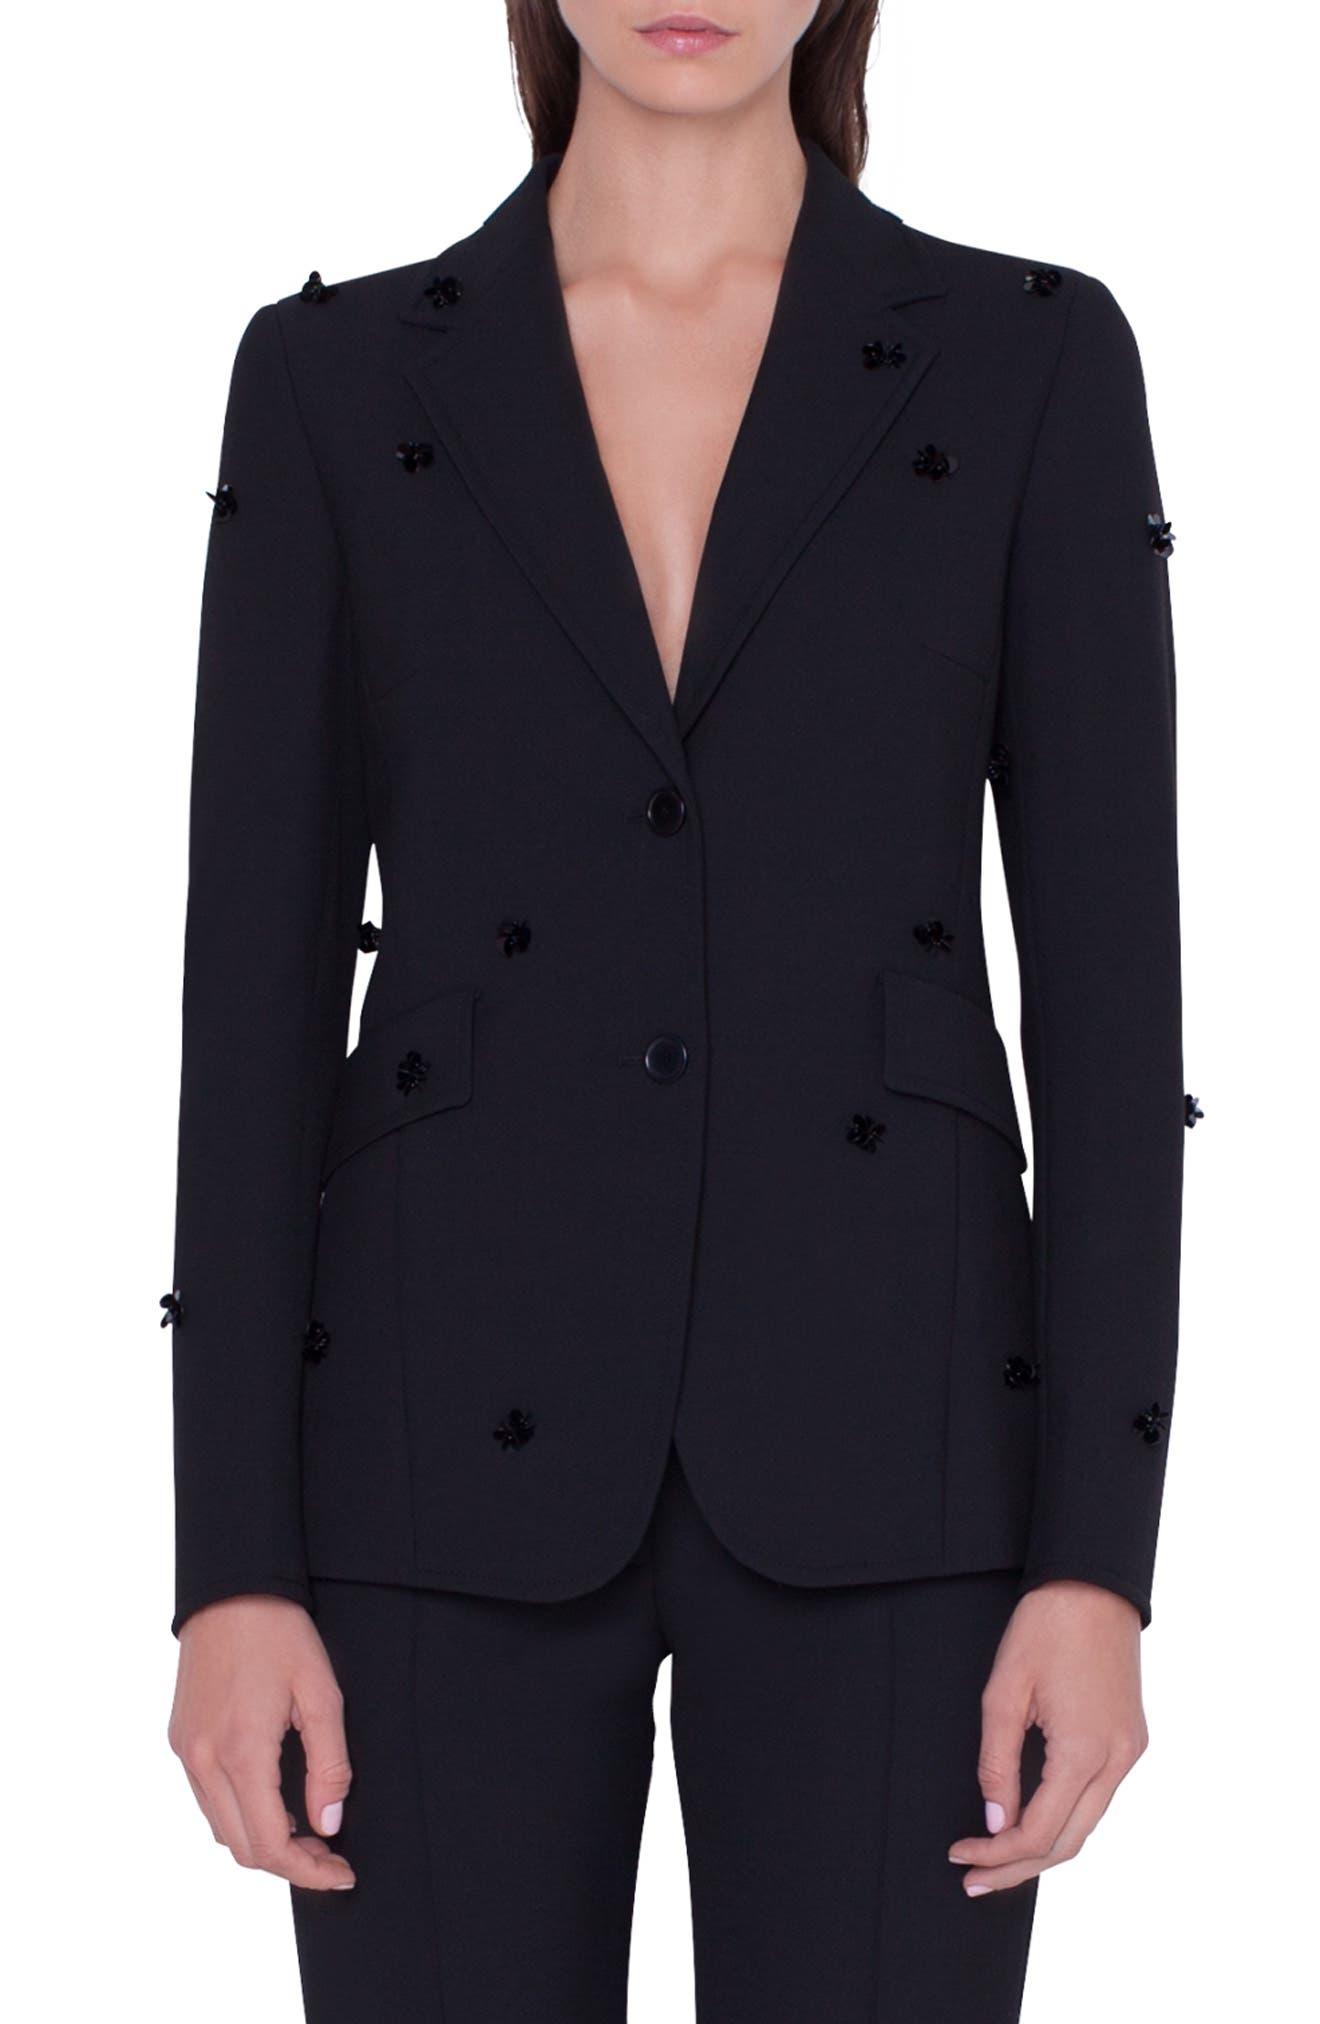 Sequined Blazer Jacket in Nero